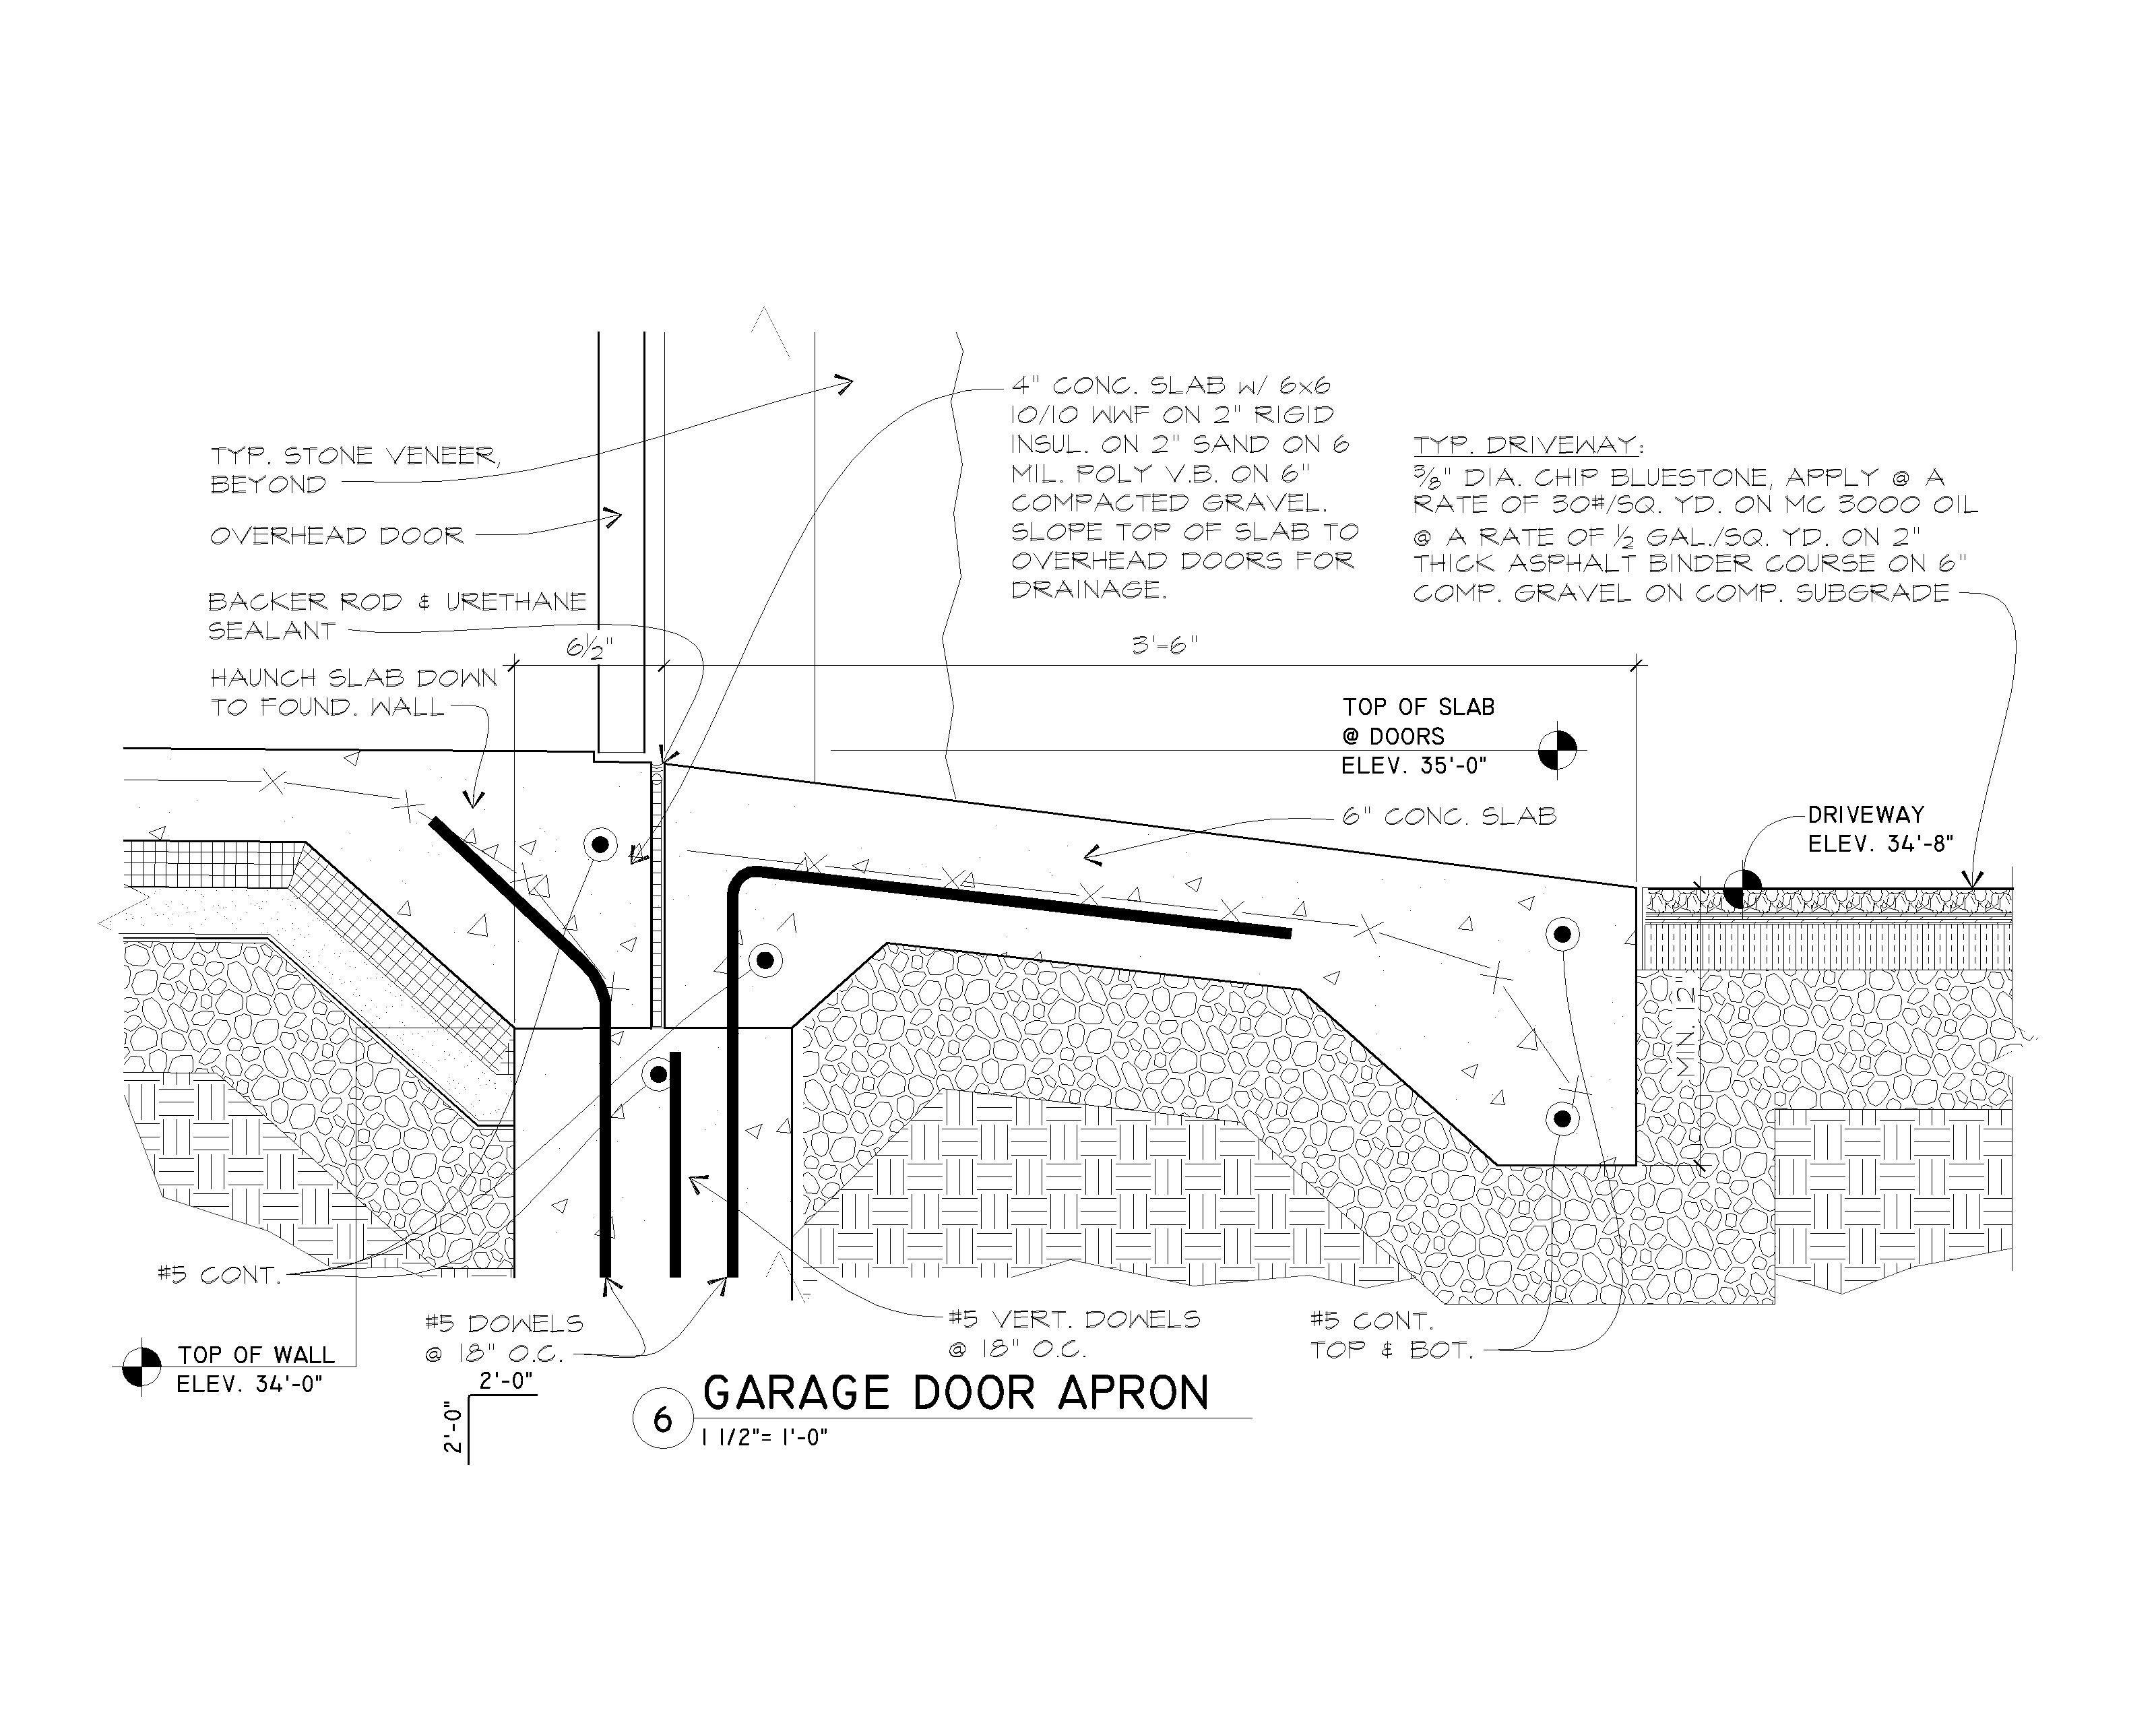 patio heater diagram grill diagram